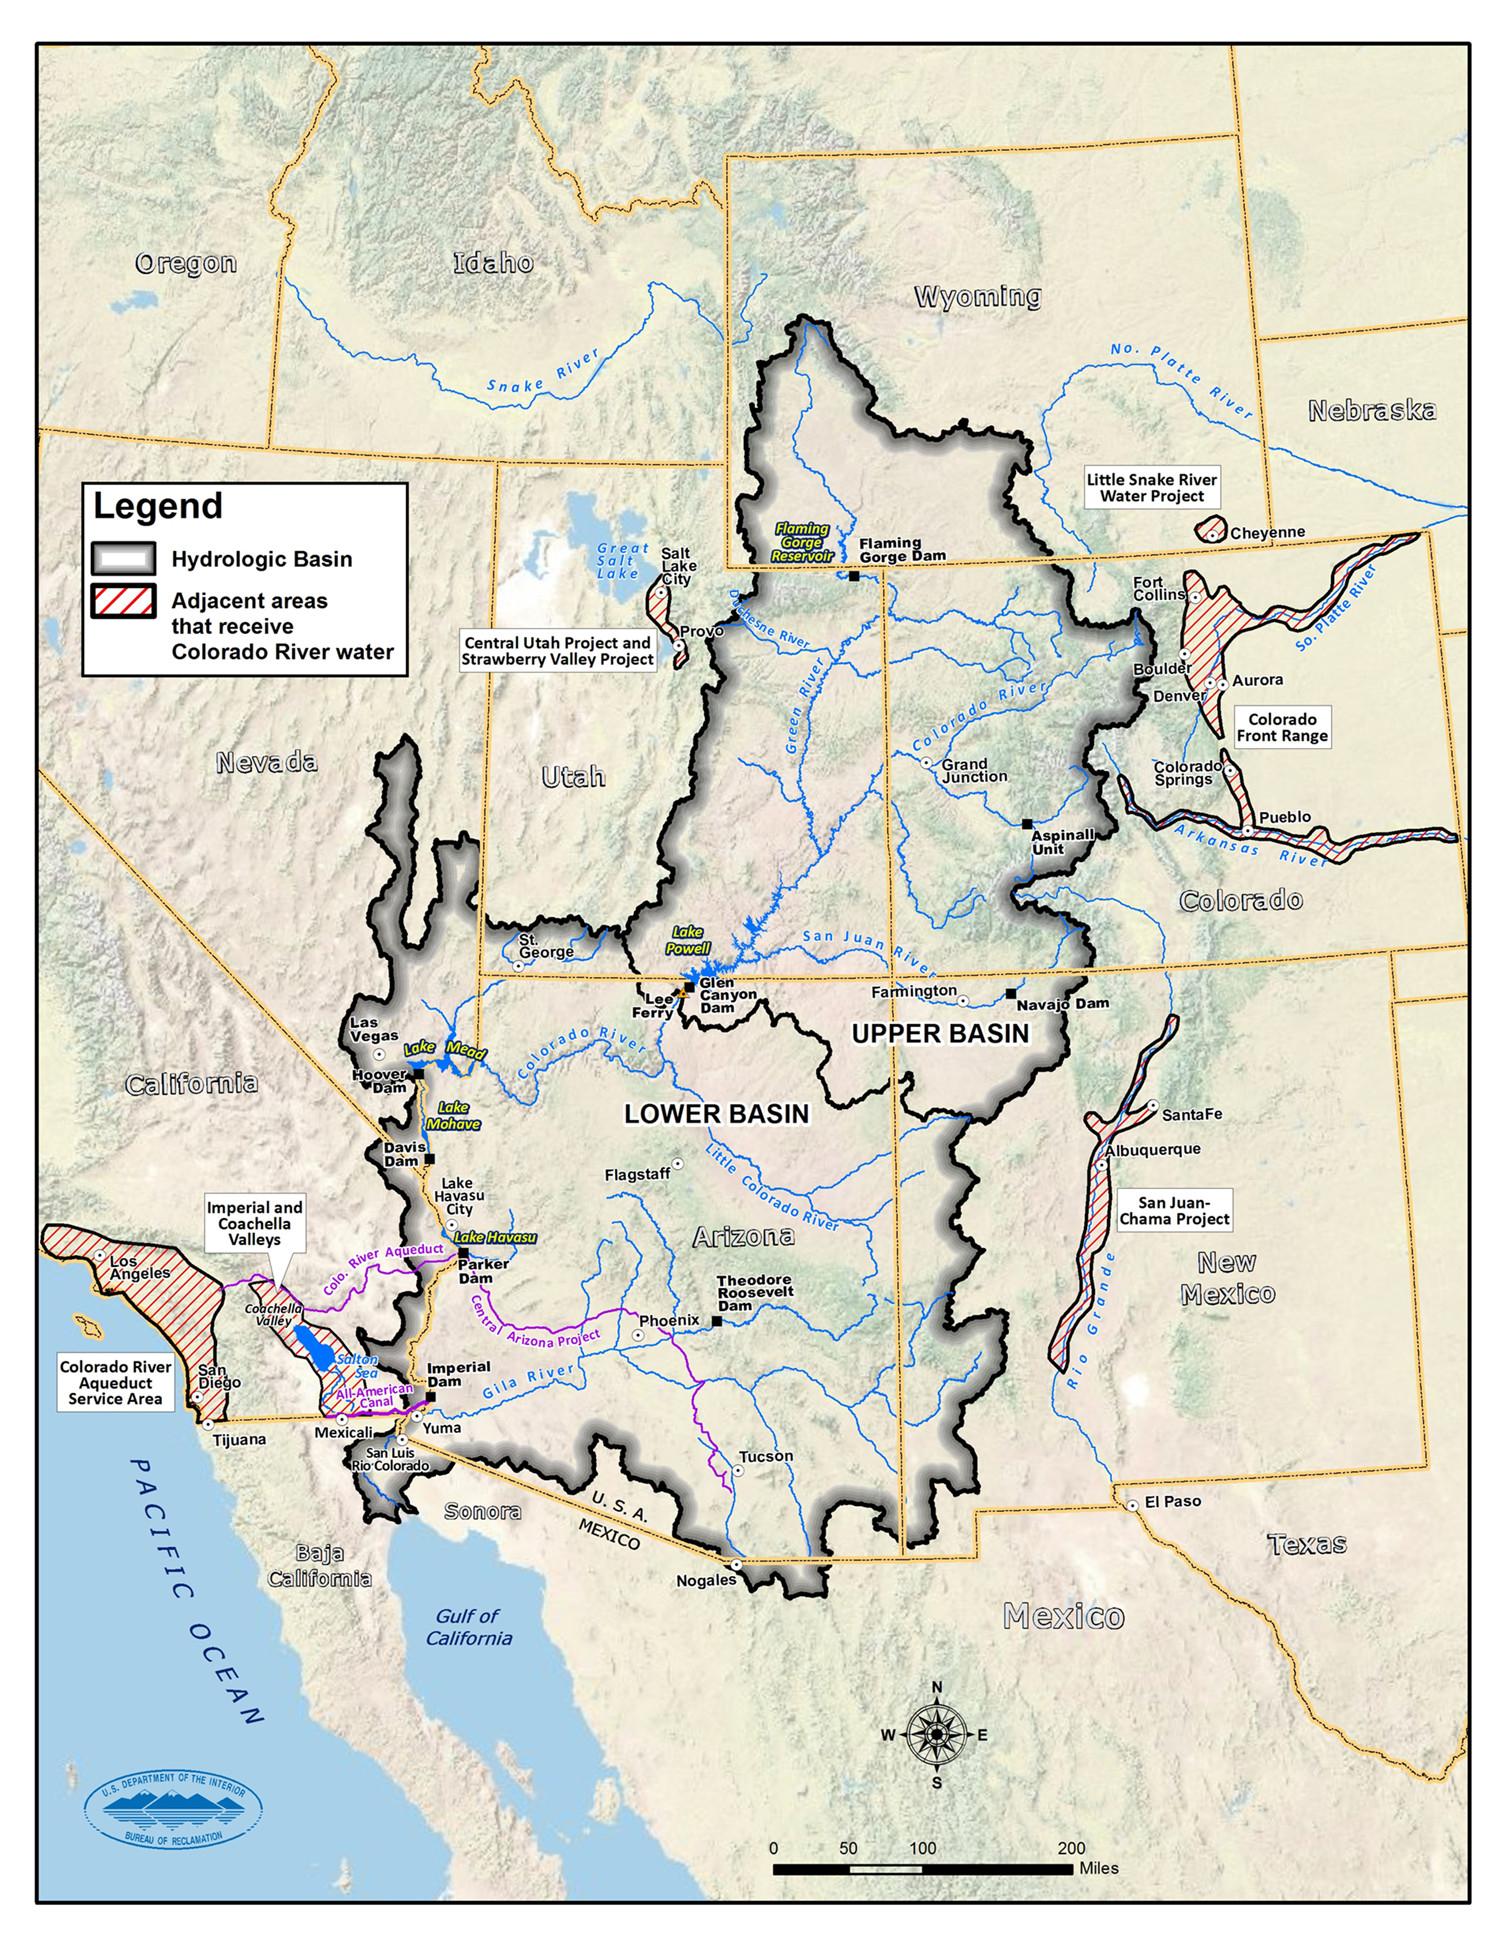 Map Of Las Vegas And California Printable En California Reservoirs - Map Of Las Vegas And California